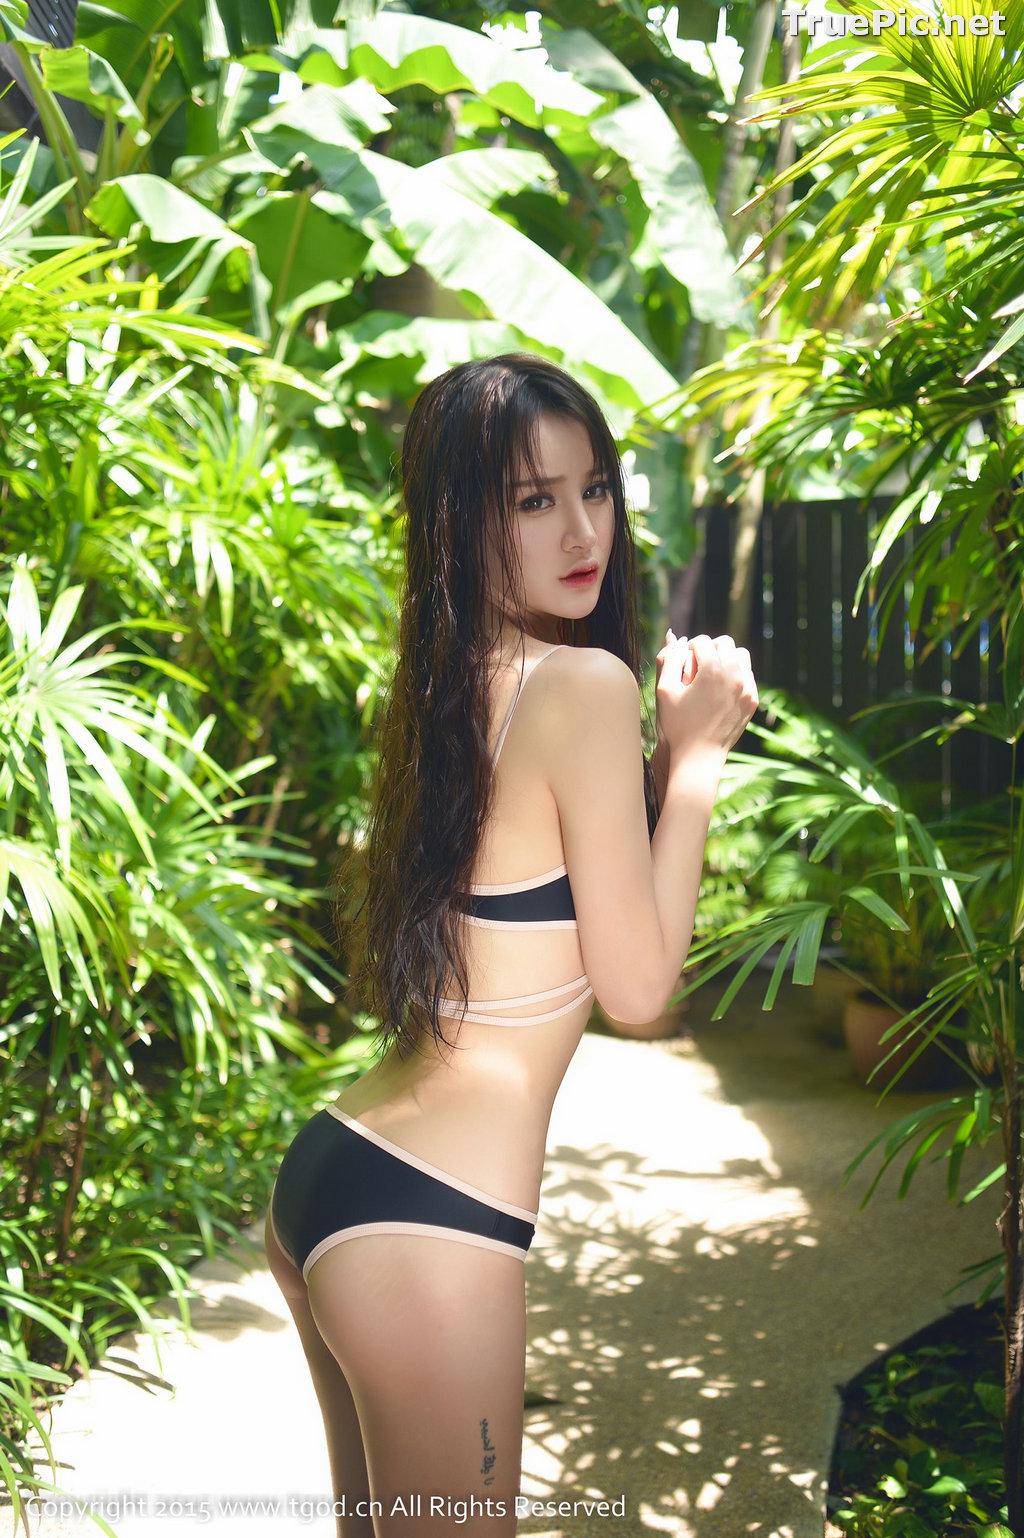 Image TGOD 2015-11-10 - Chinese Sexy Model - Cheryl (青树) - TruePic.net - Picture-26